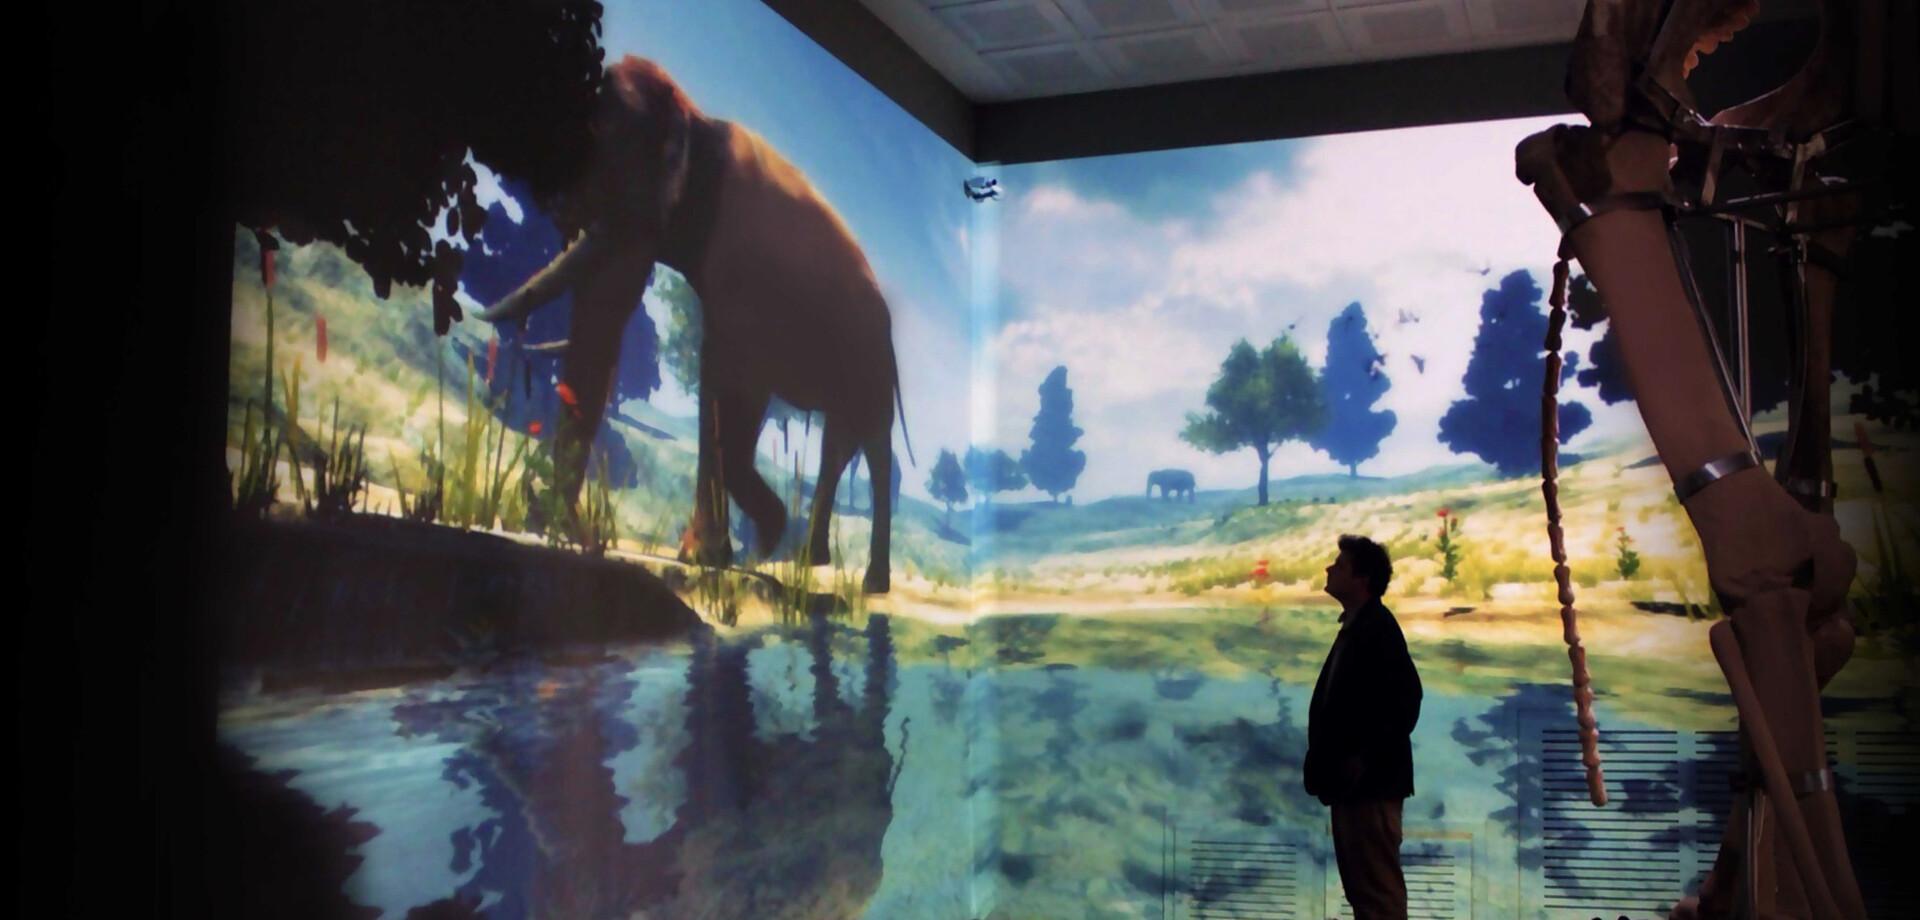 interactive virtual life simulation of the extinct Maras elephant, Maras Museum, 2012